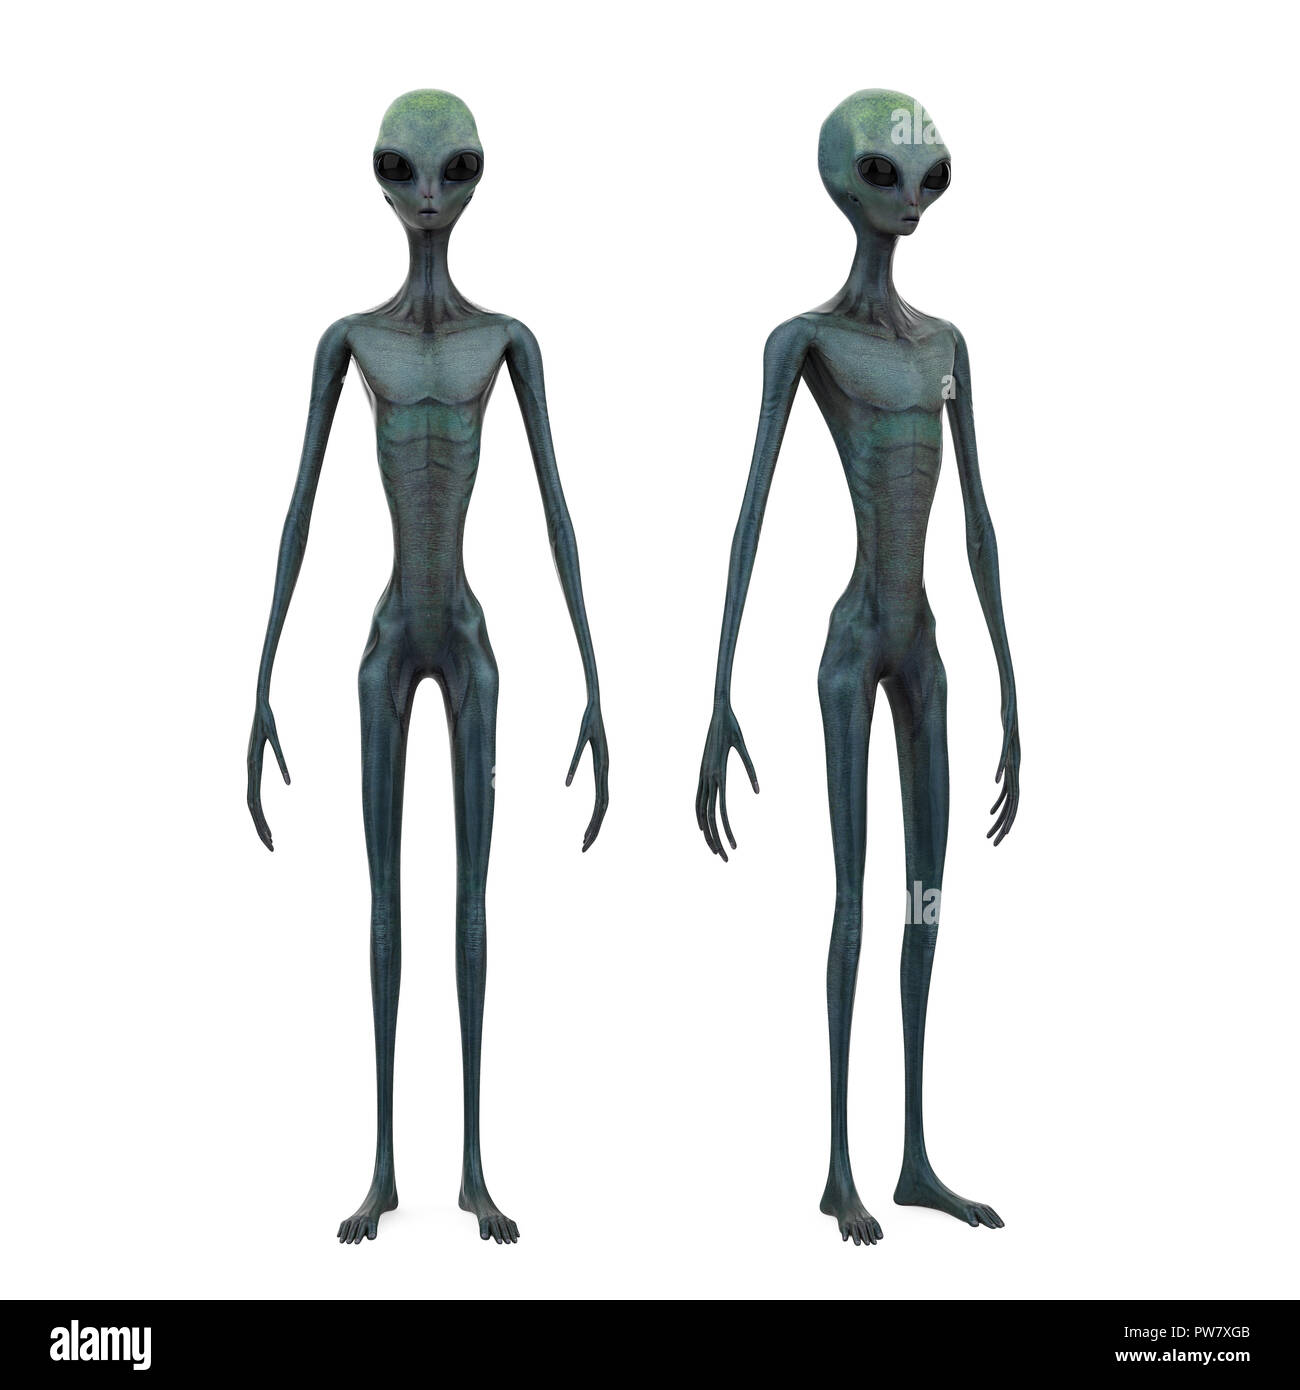 Alien Creature Isolated - Stock Image